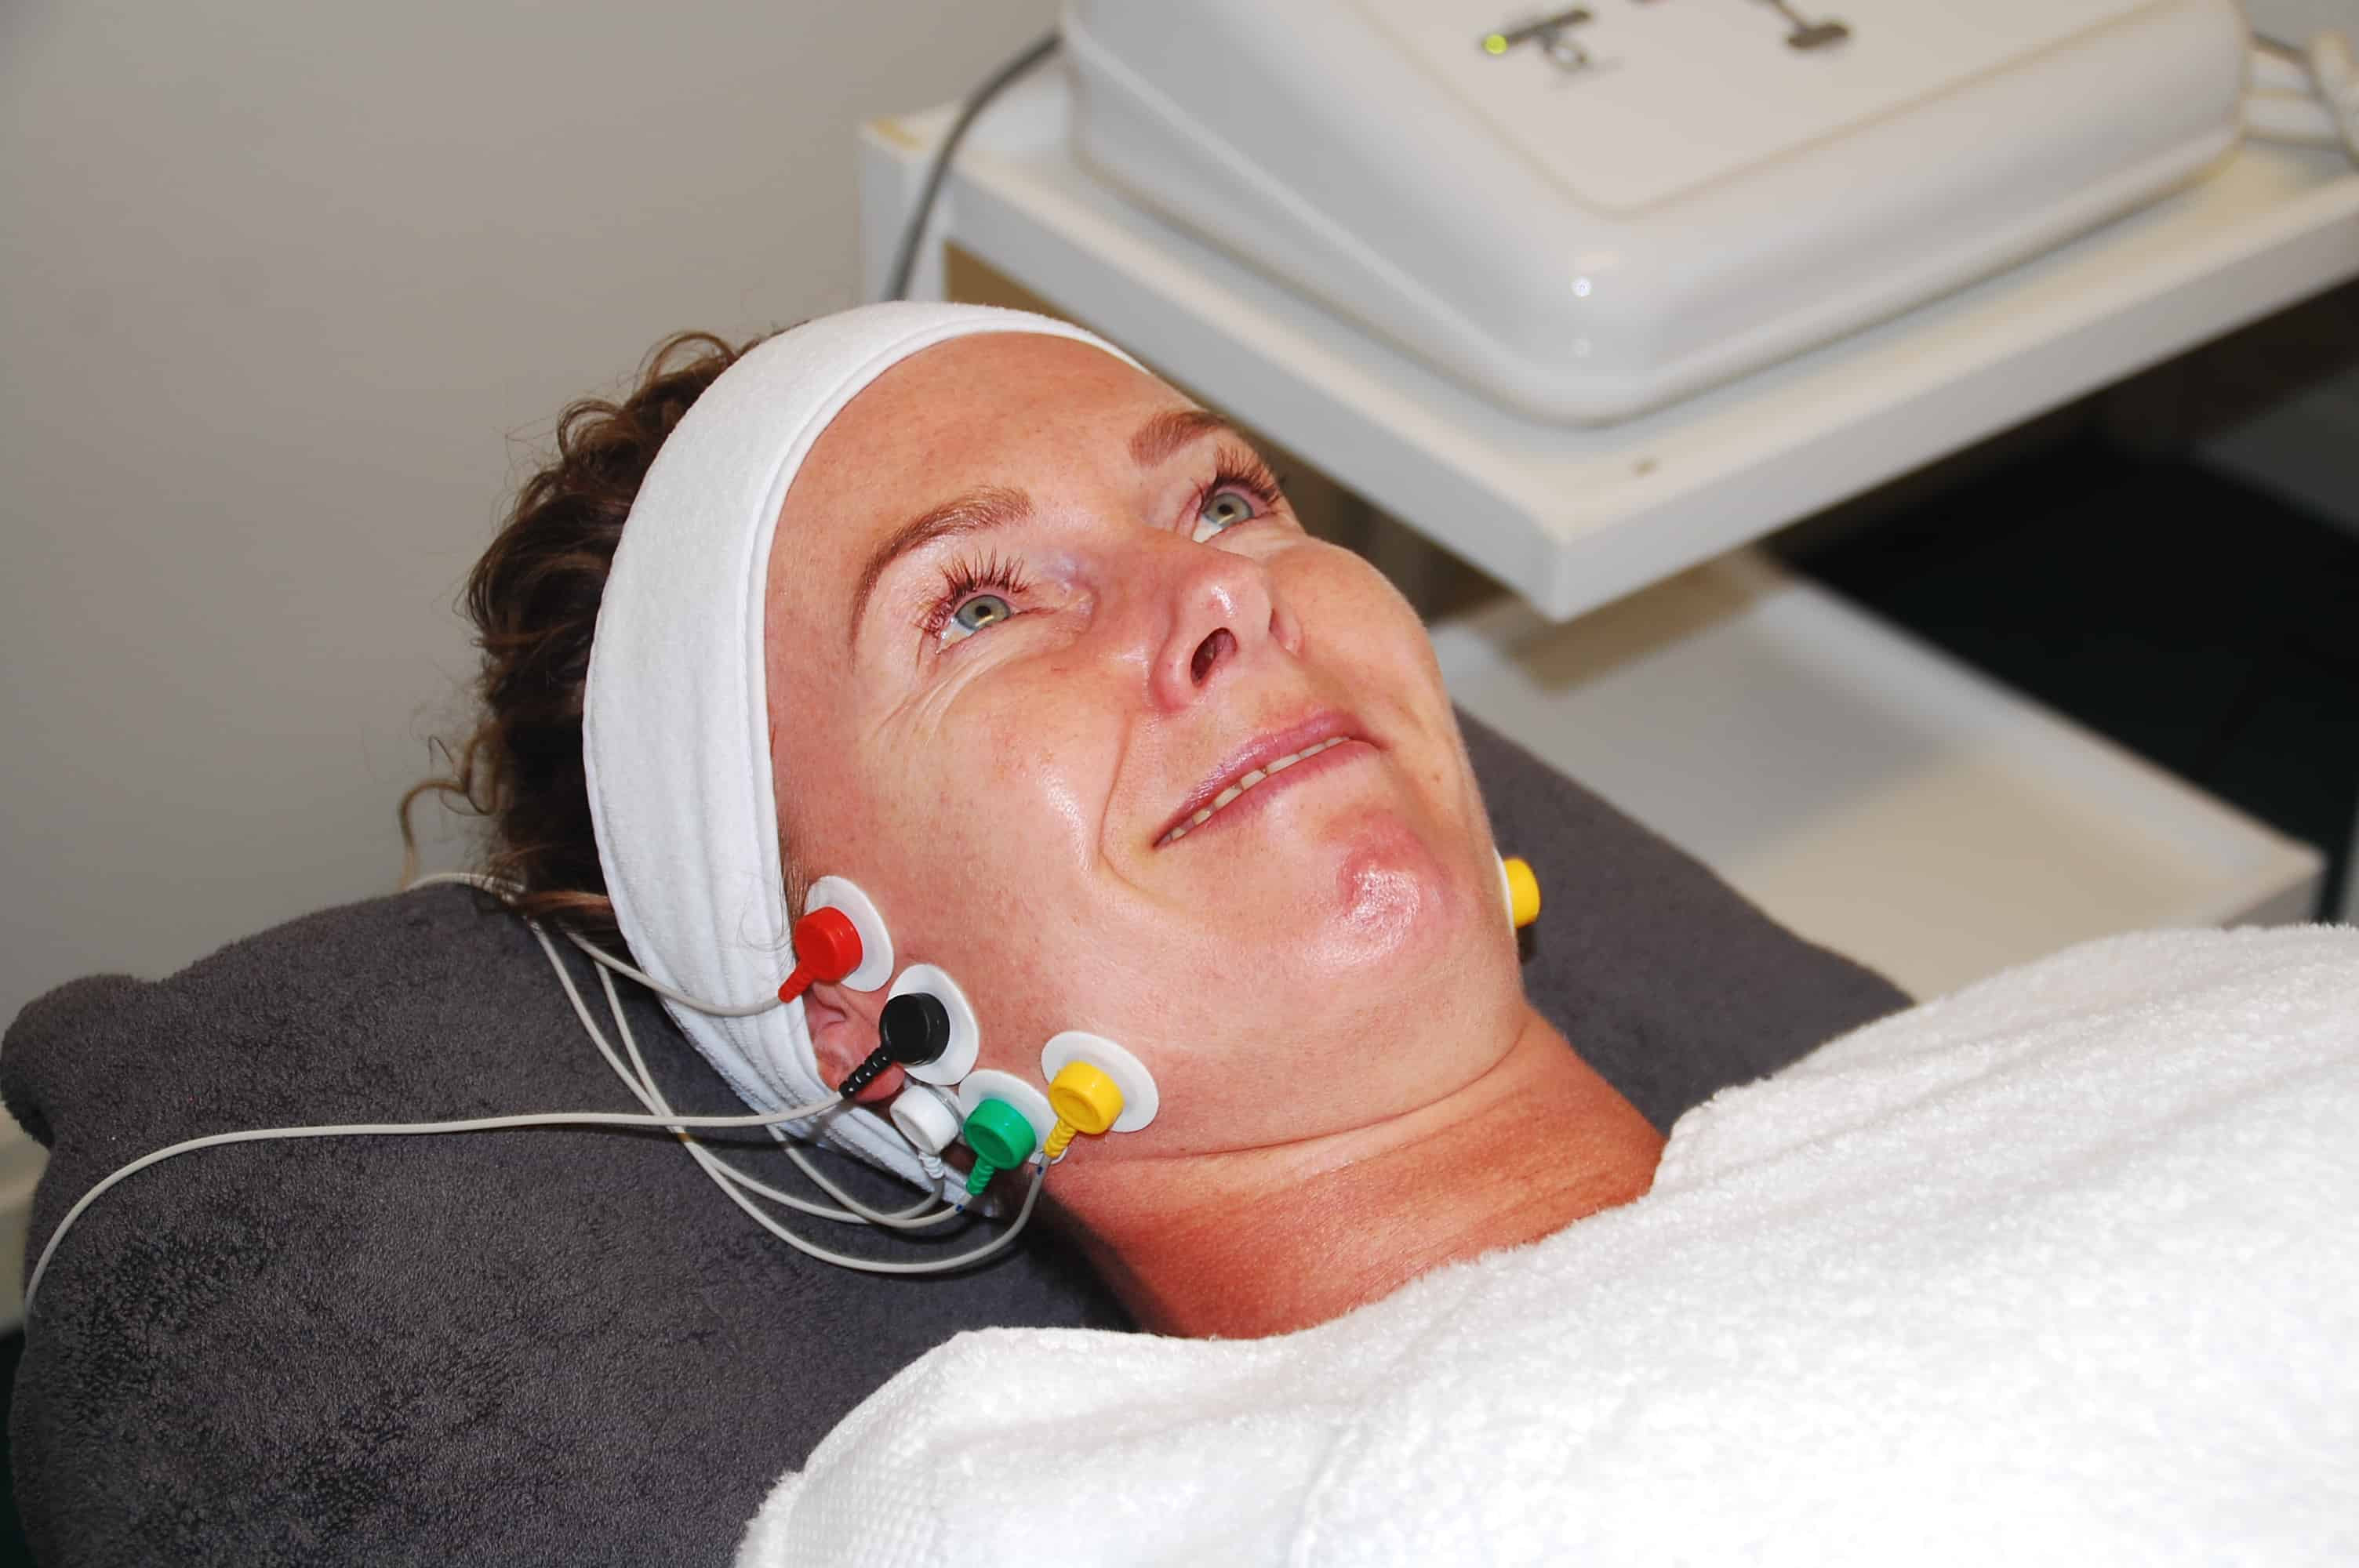 Non surgical face lifting